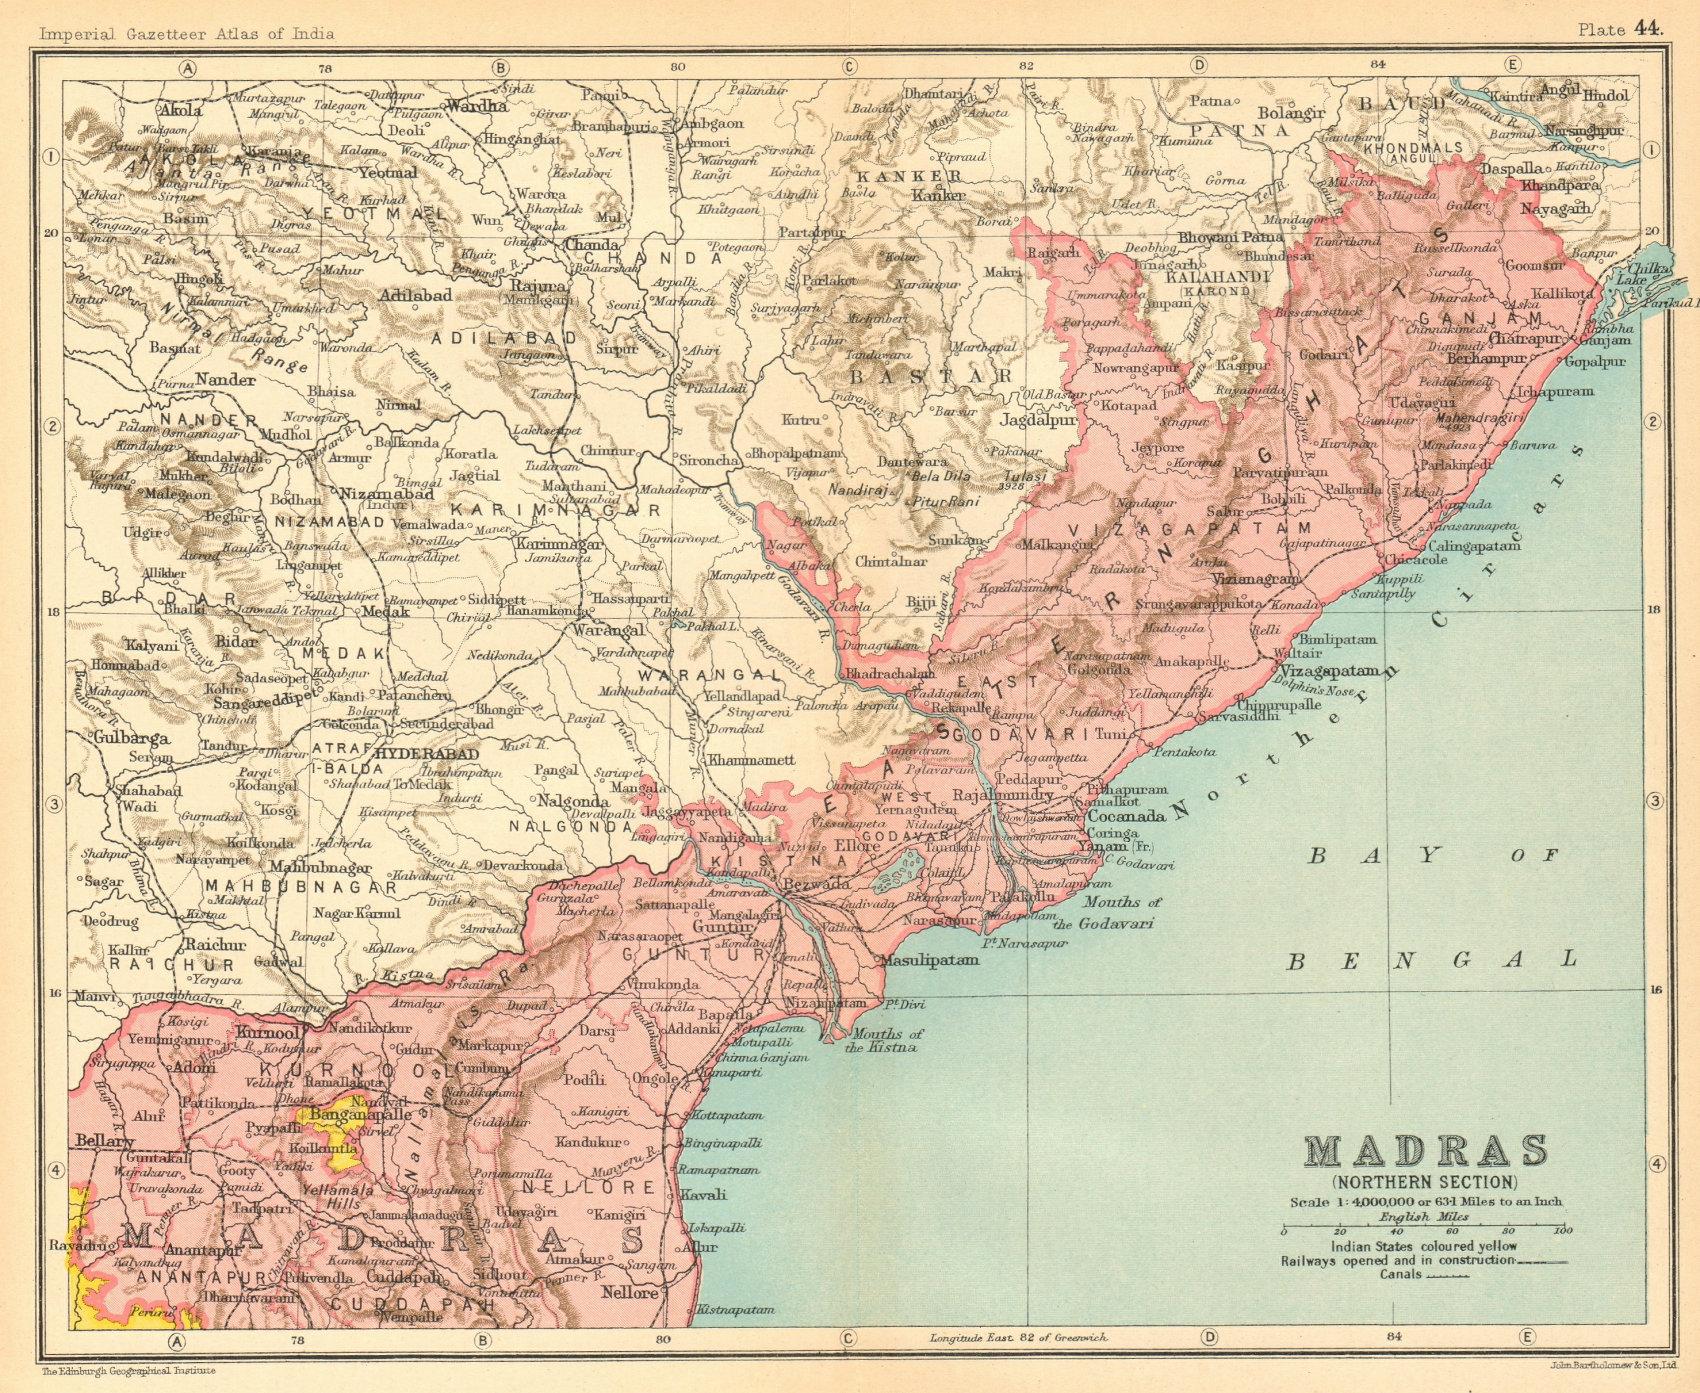 'Madras (Northern Section)'. British India provinces. Andhra Pradesh 1931 map